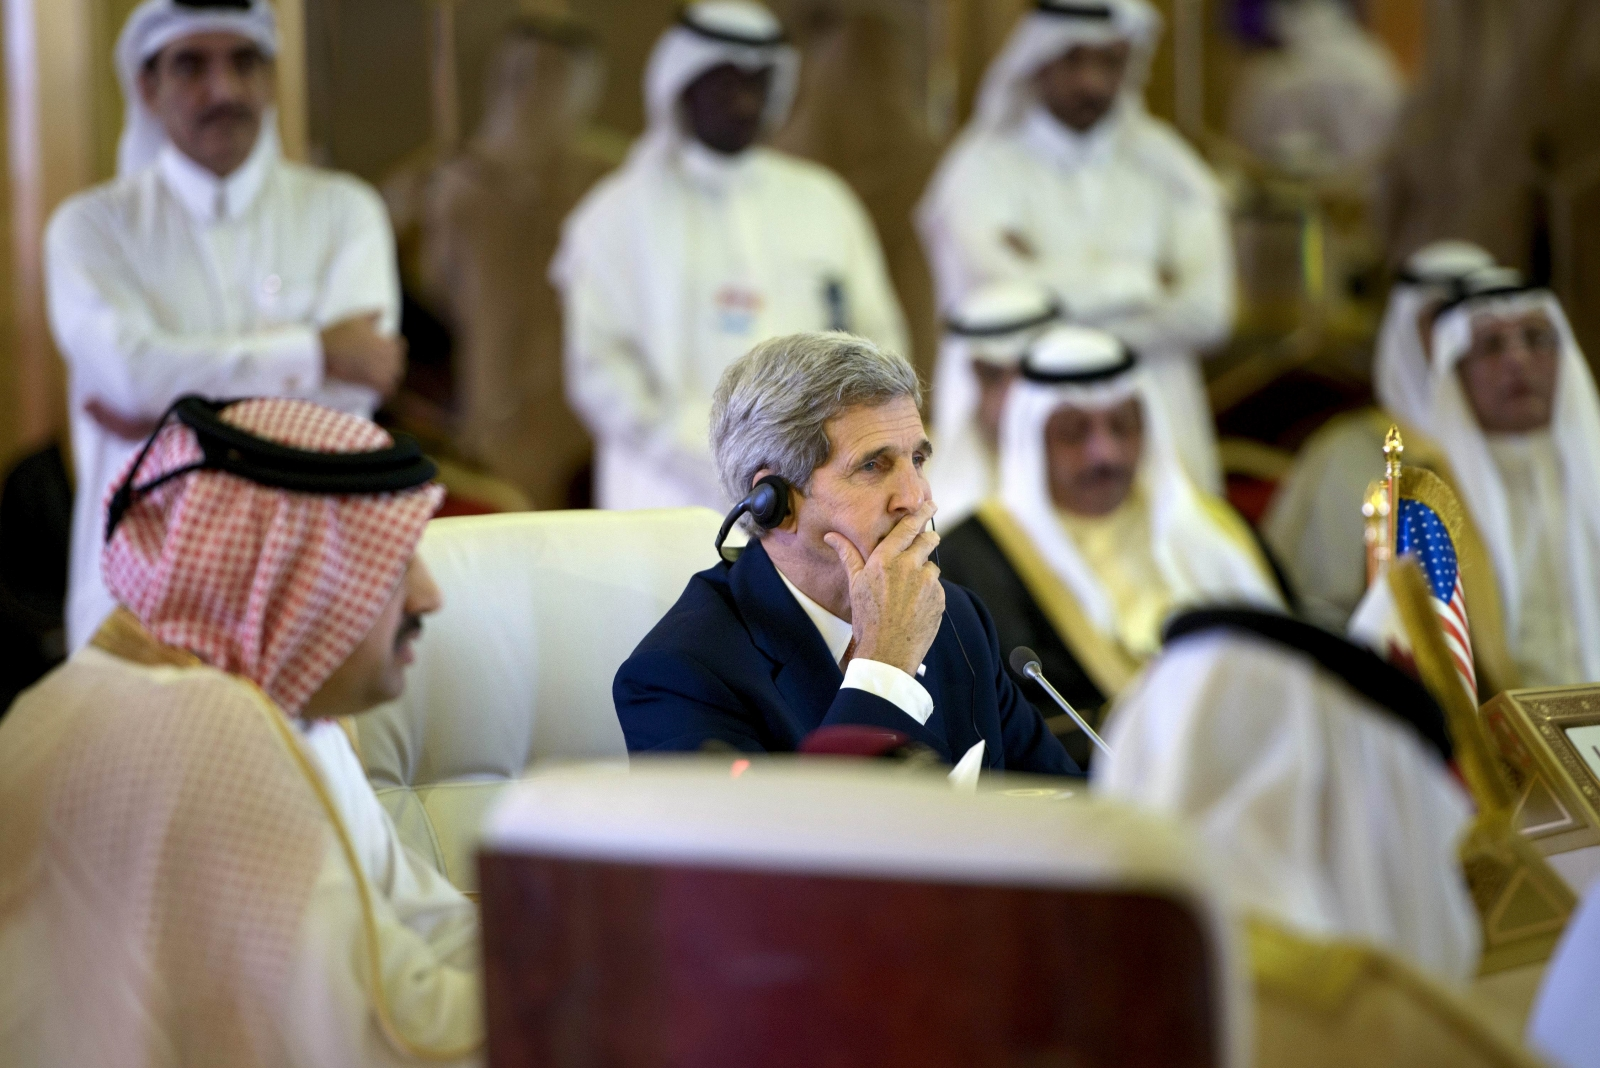 John Kerry Middle East tour